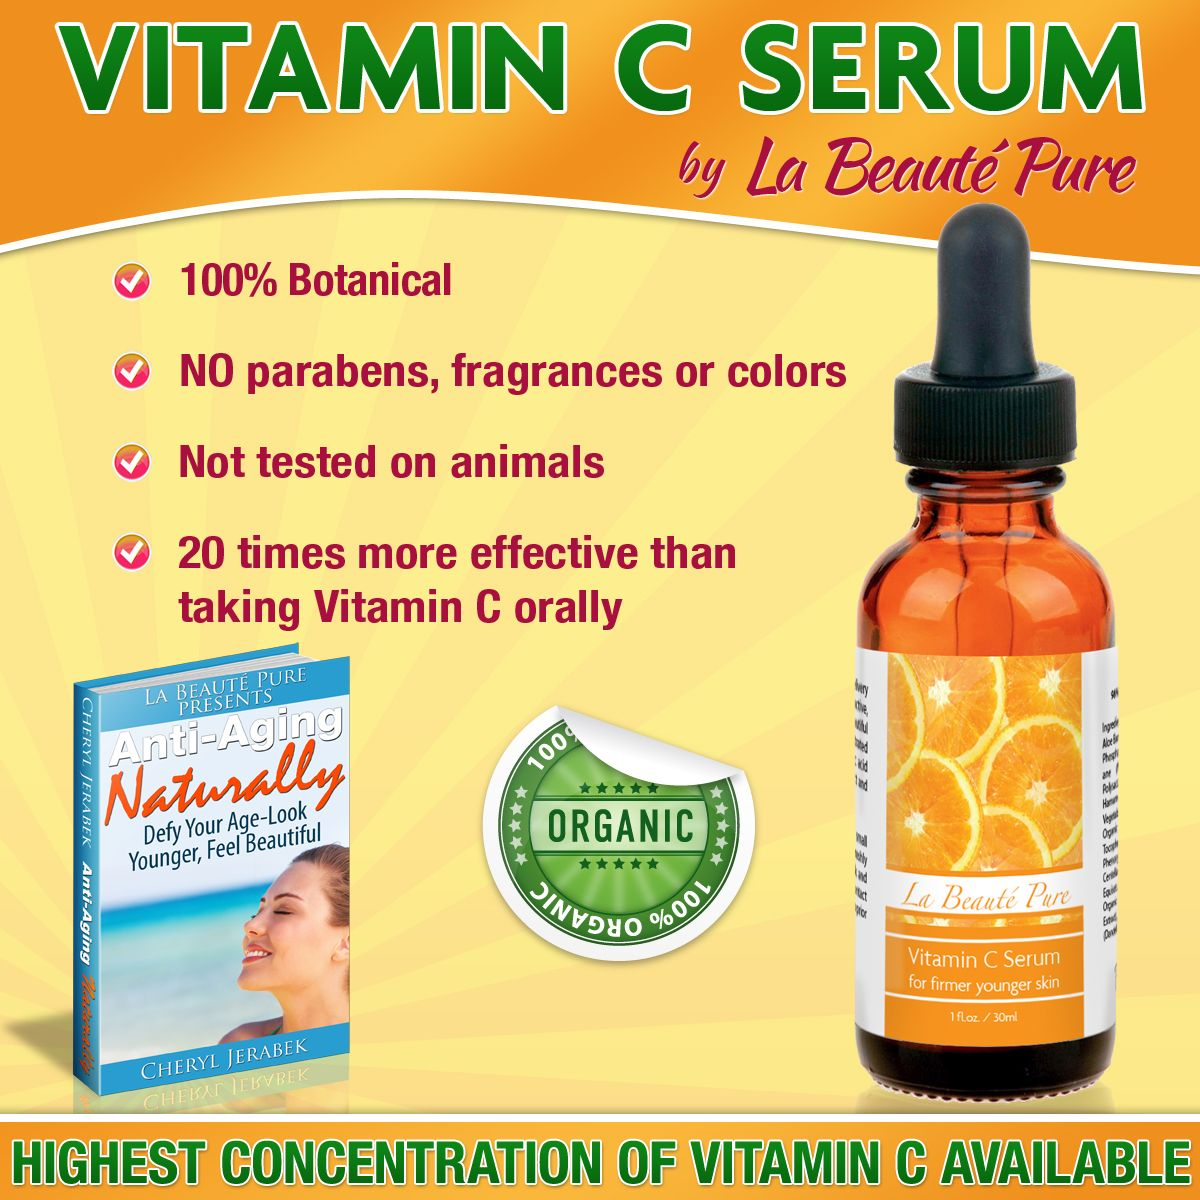 Enjoy the benefits of a quality Vitamin C Serum! Vitamin